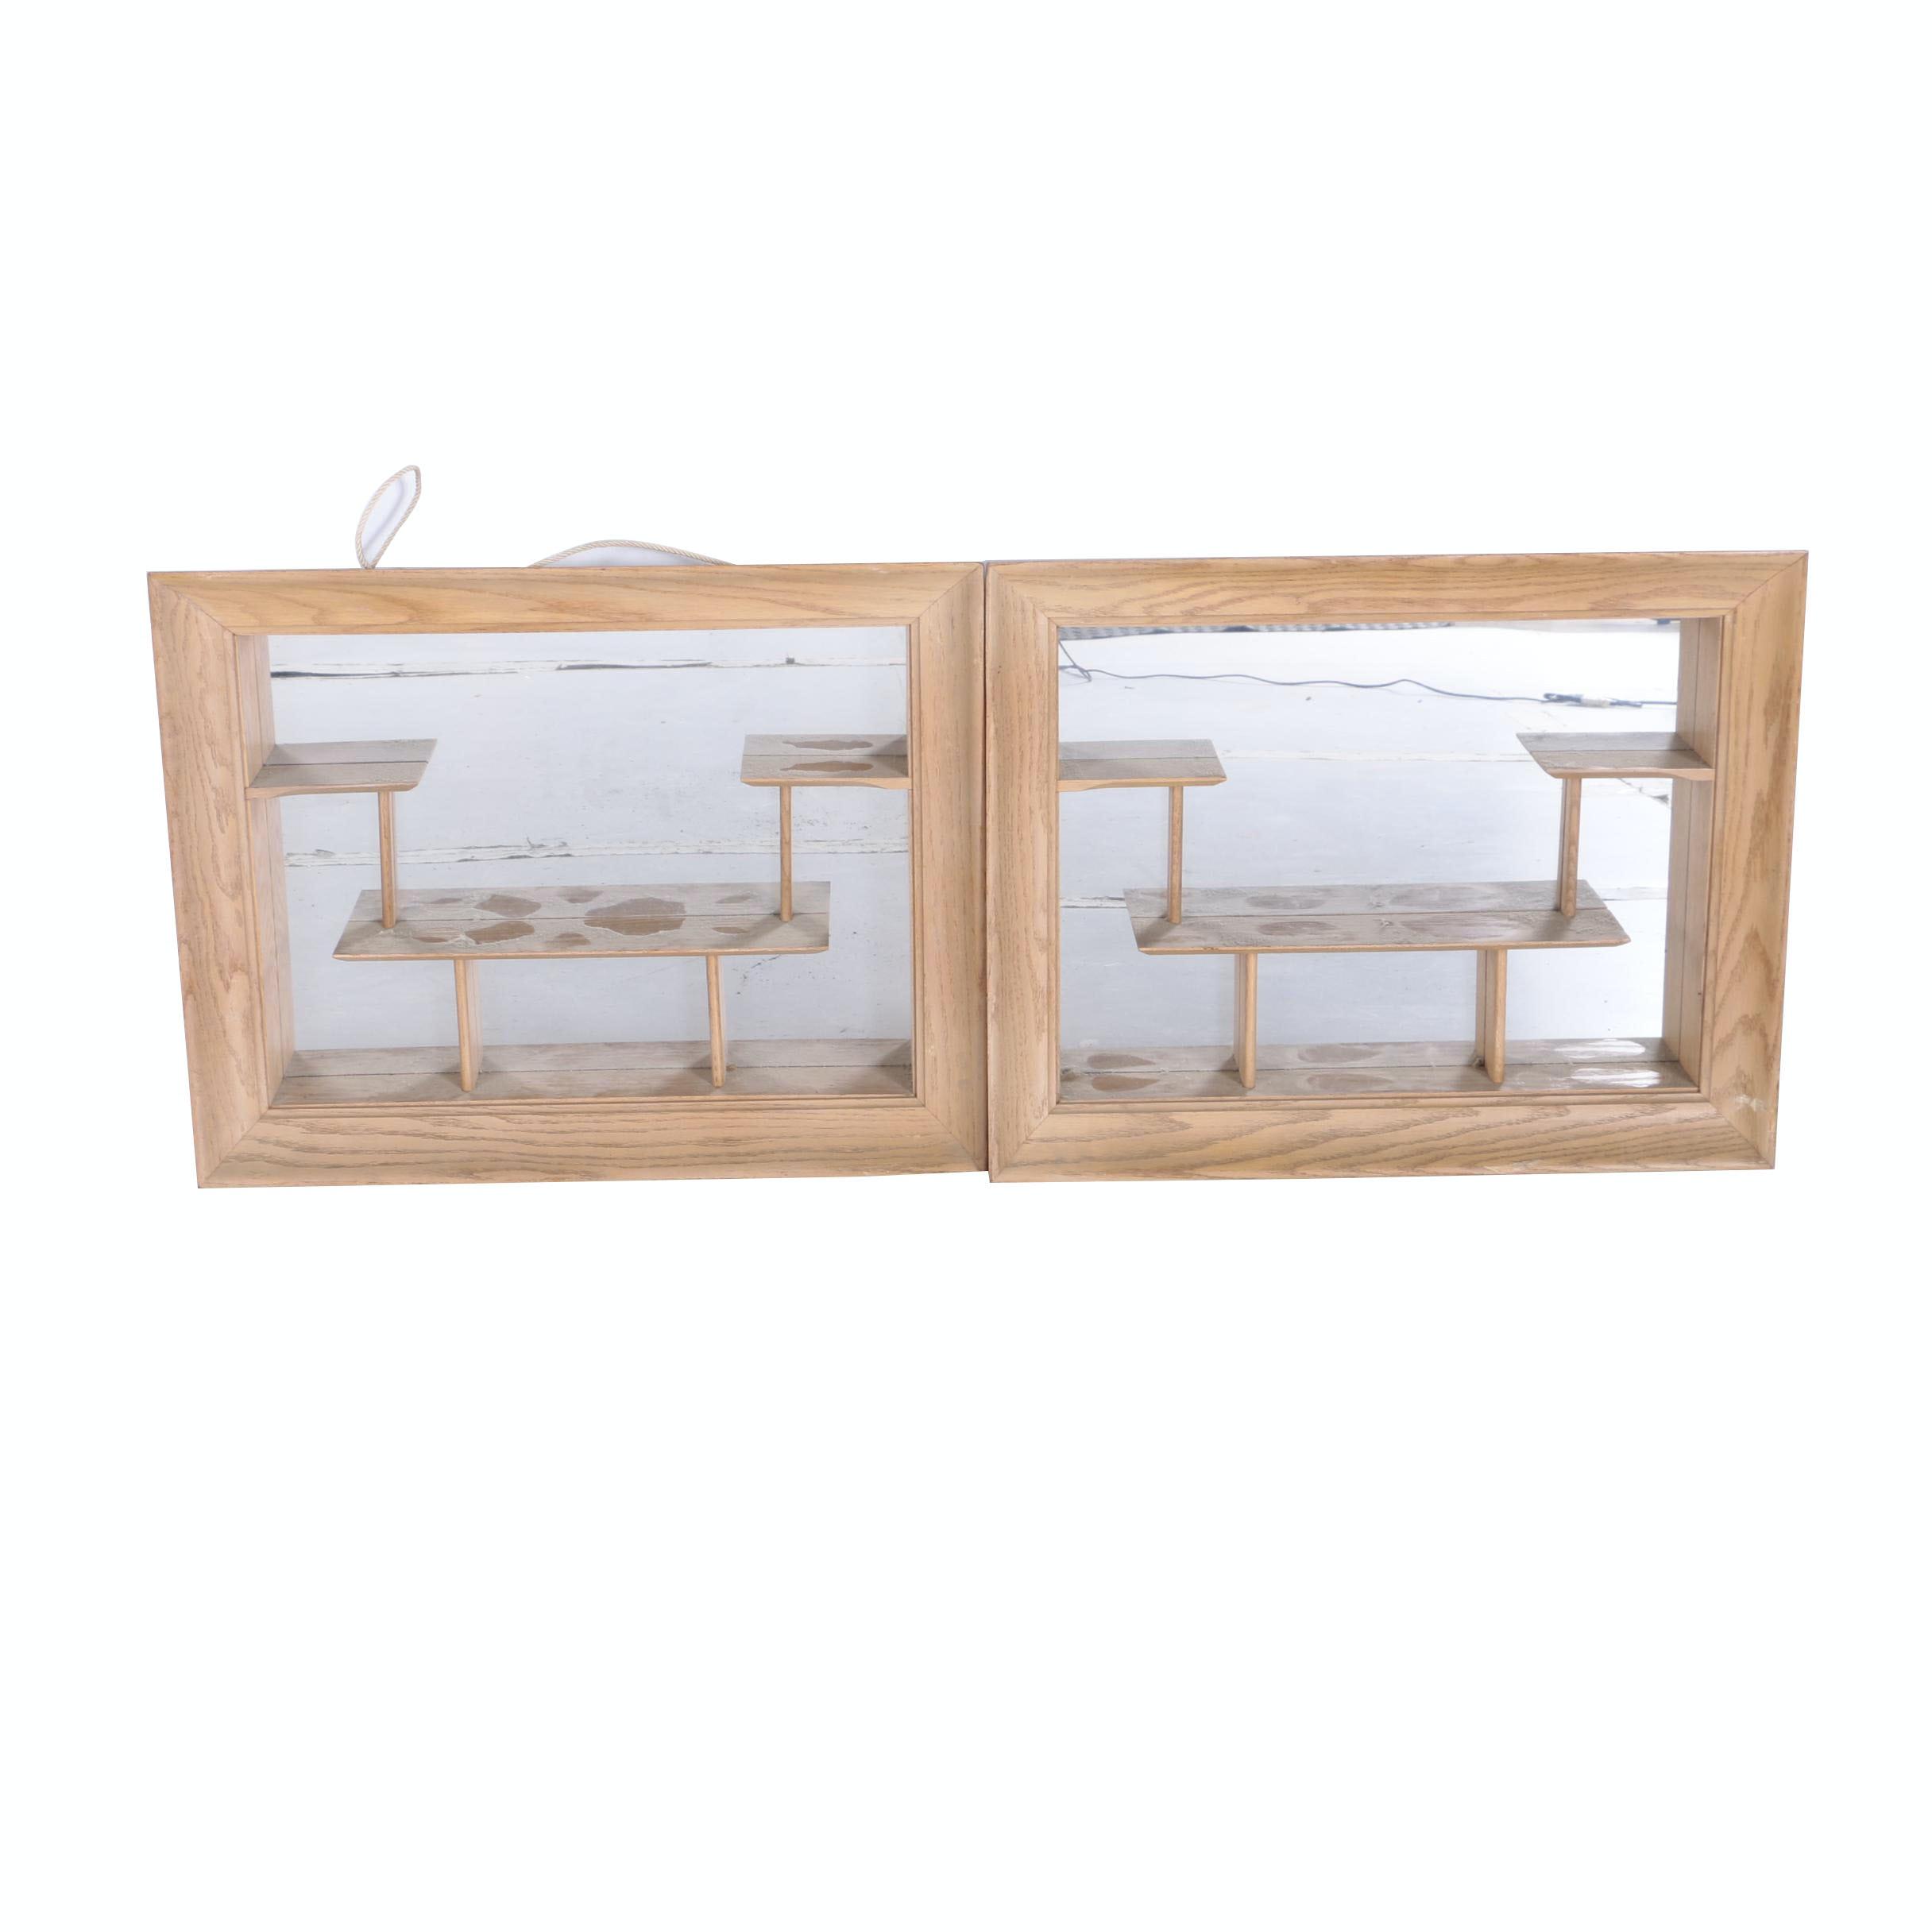 Pair Light Tone Oak Shelf Display Wall Mirrors